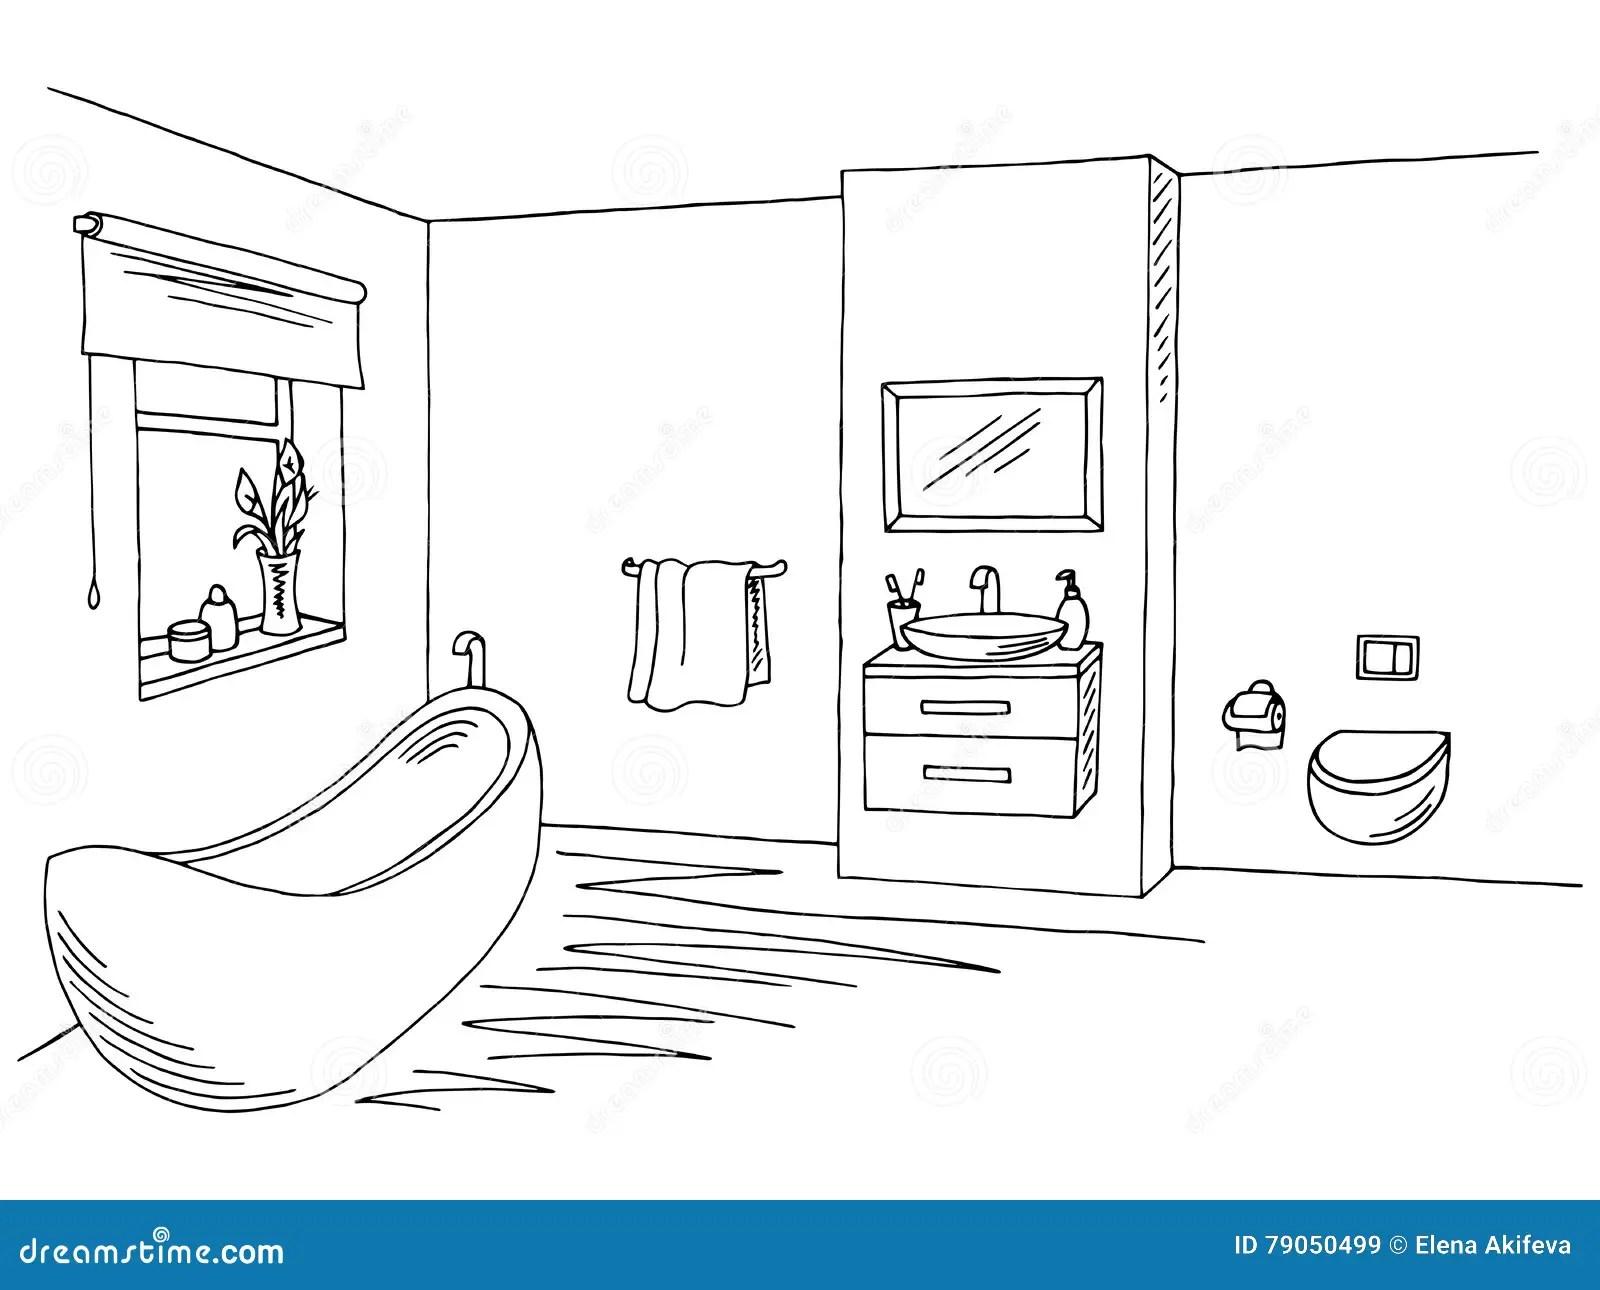 Bathroom Interior Black White Graphic Art Sketch Illustration Stock Vector